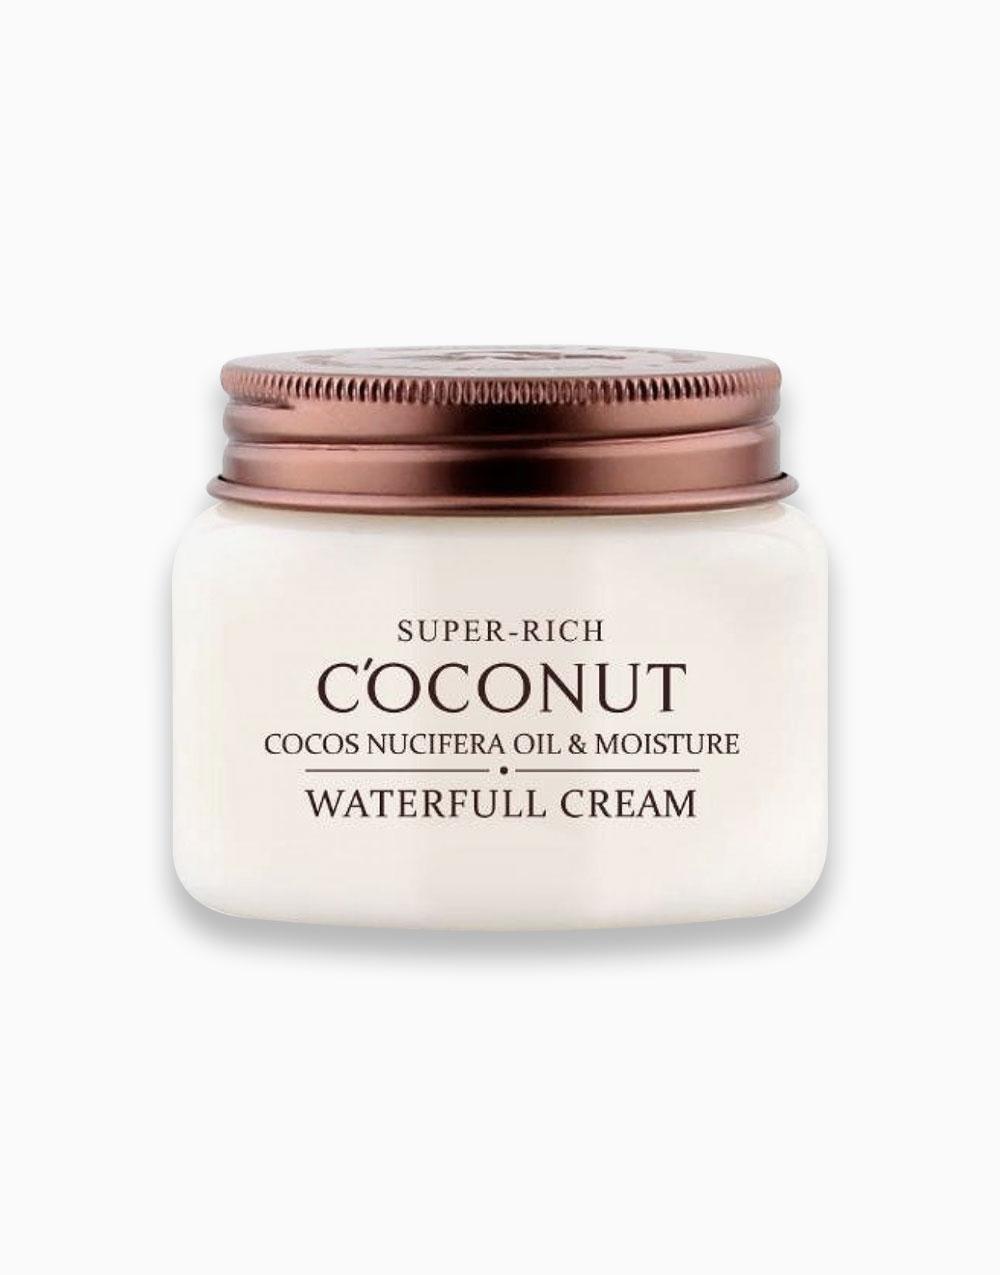 Super Rich Coconut Waterfull Cream by Esfolio